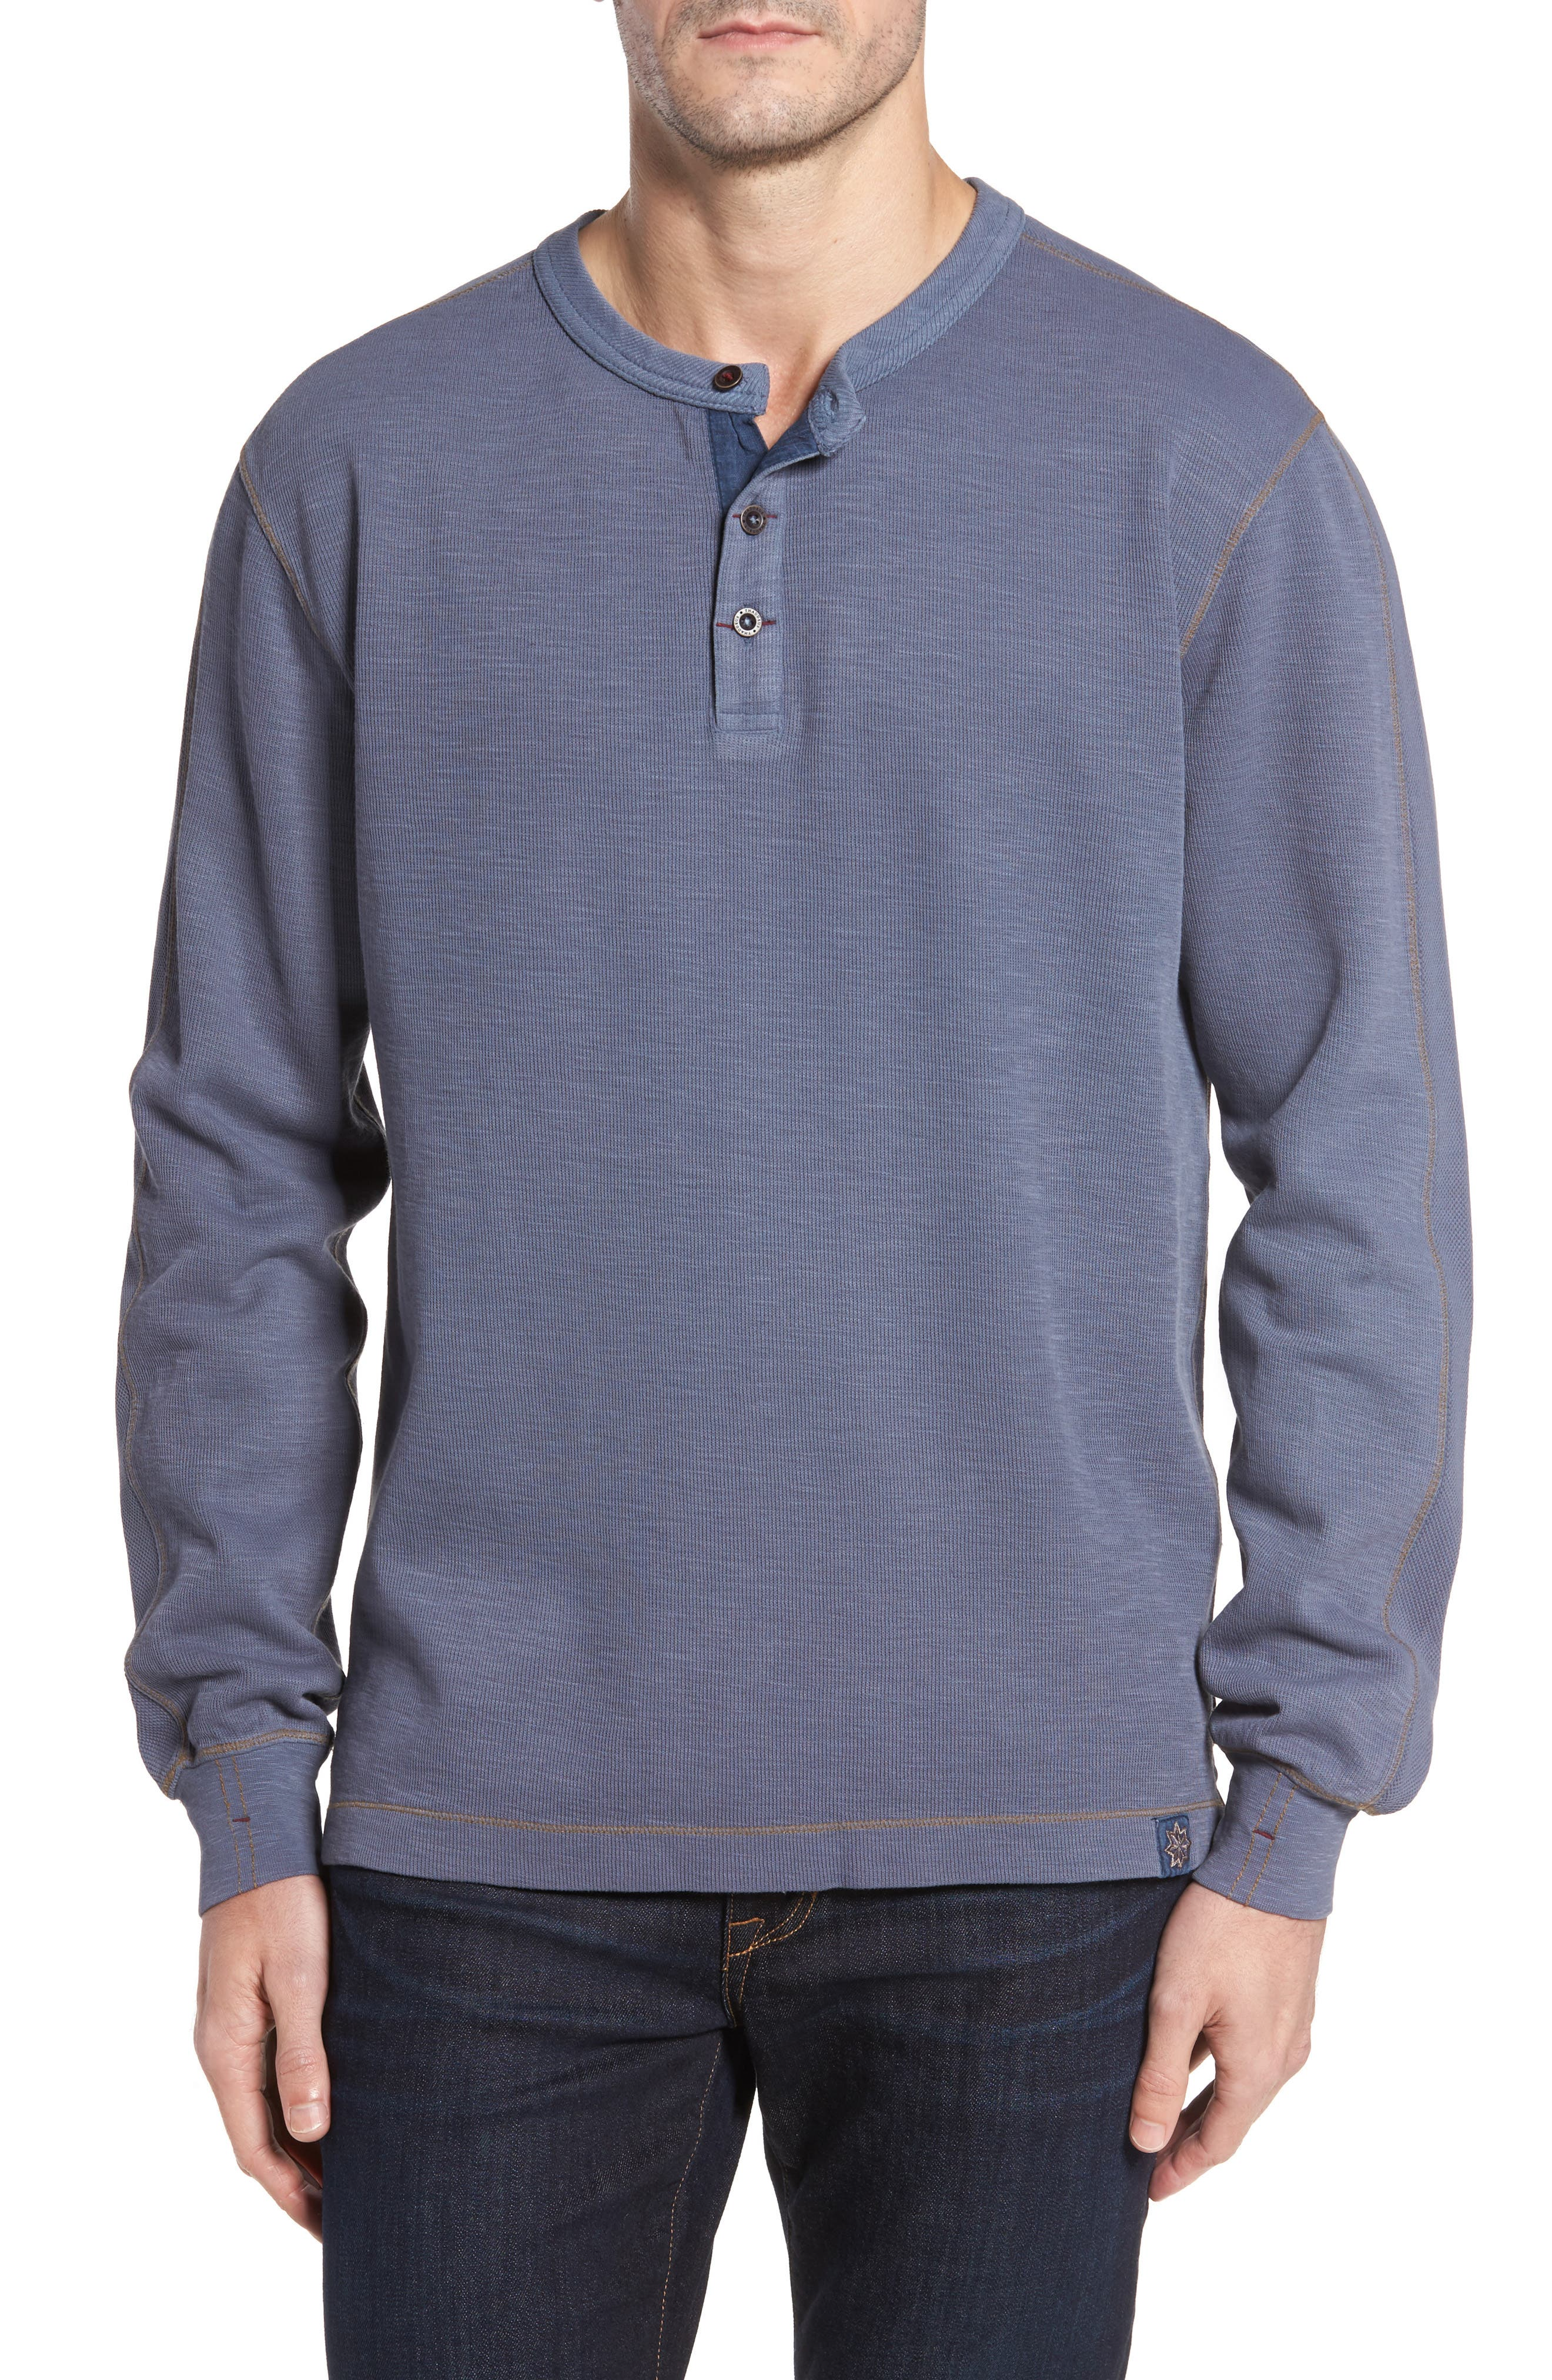 Hans Long Sleeve Henley T-Shirt,                             Main thumbnail 1, color,                             014